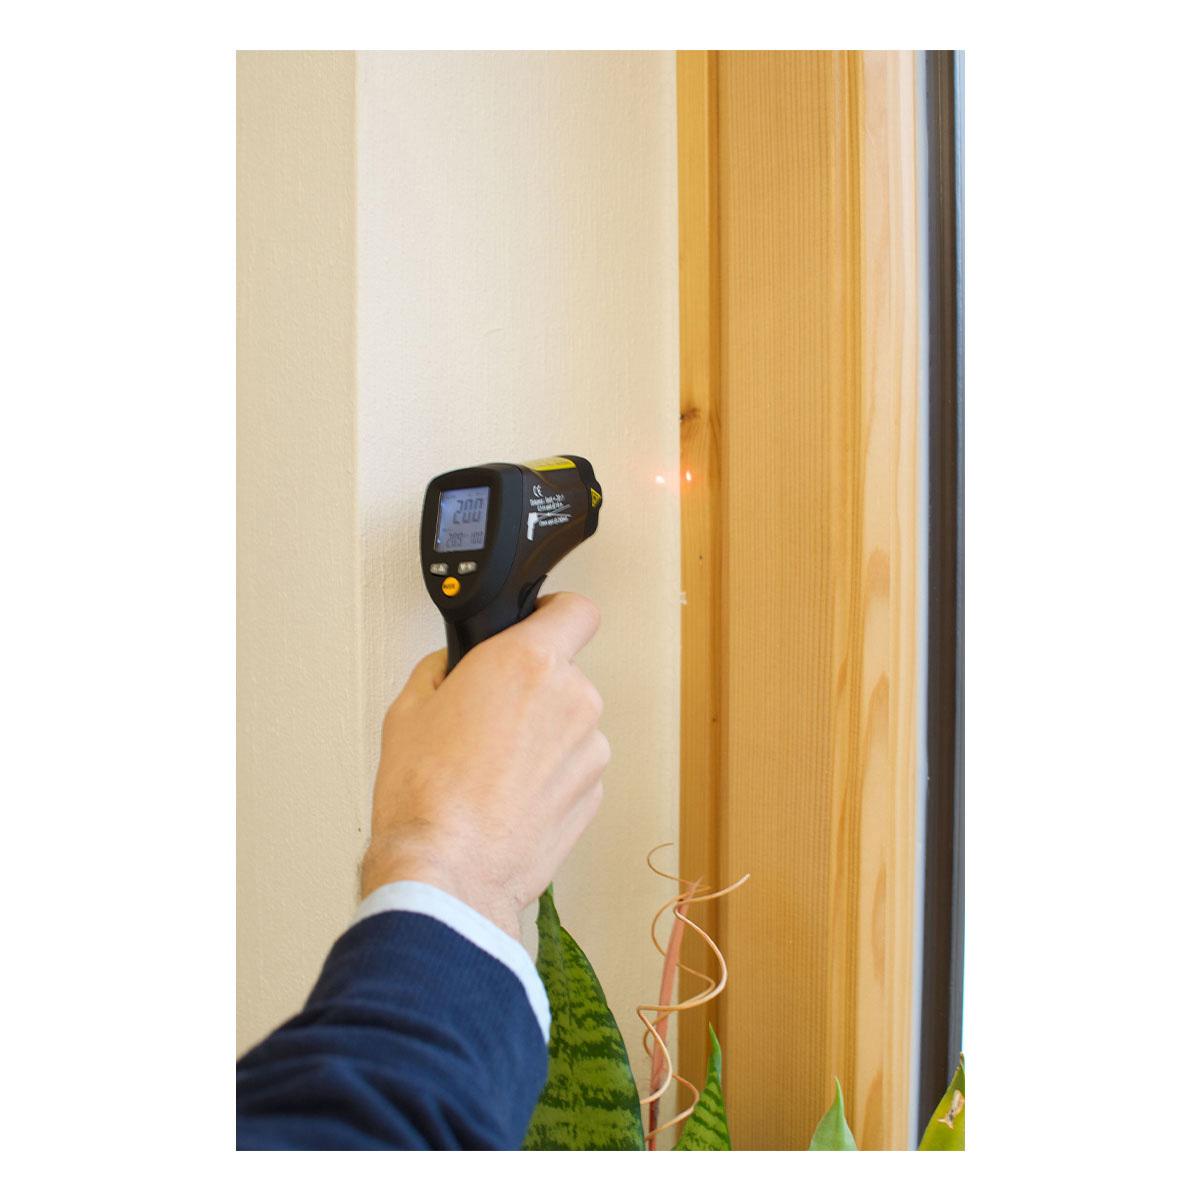 31-1124-infrarot-thermometer-scantemp-485-anwendung1-1200x1200px.jpg